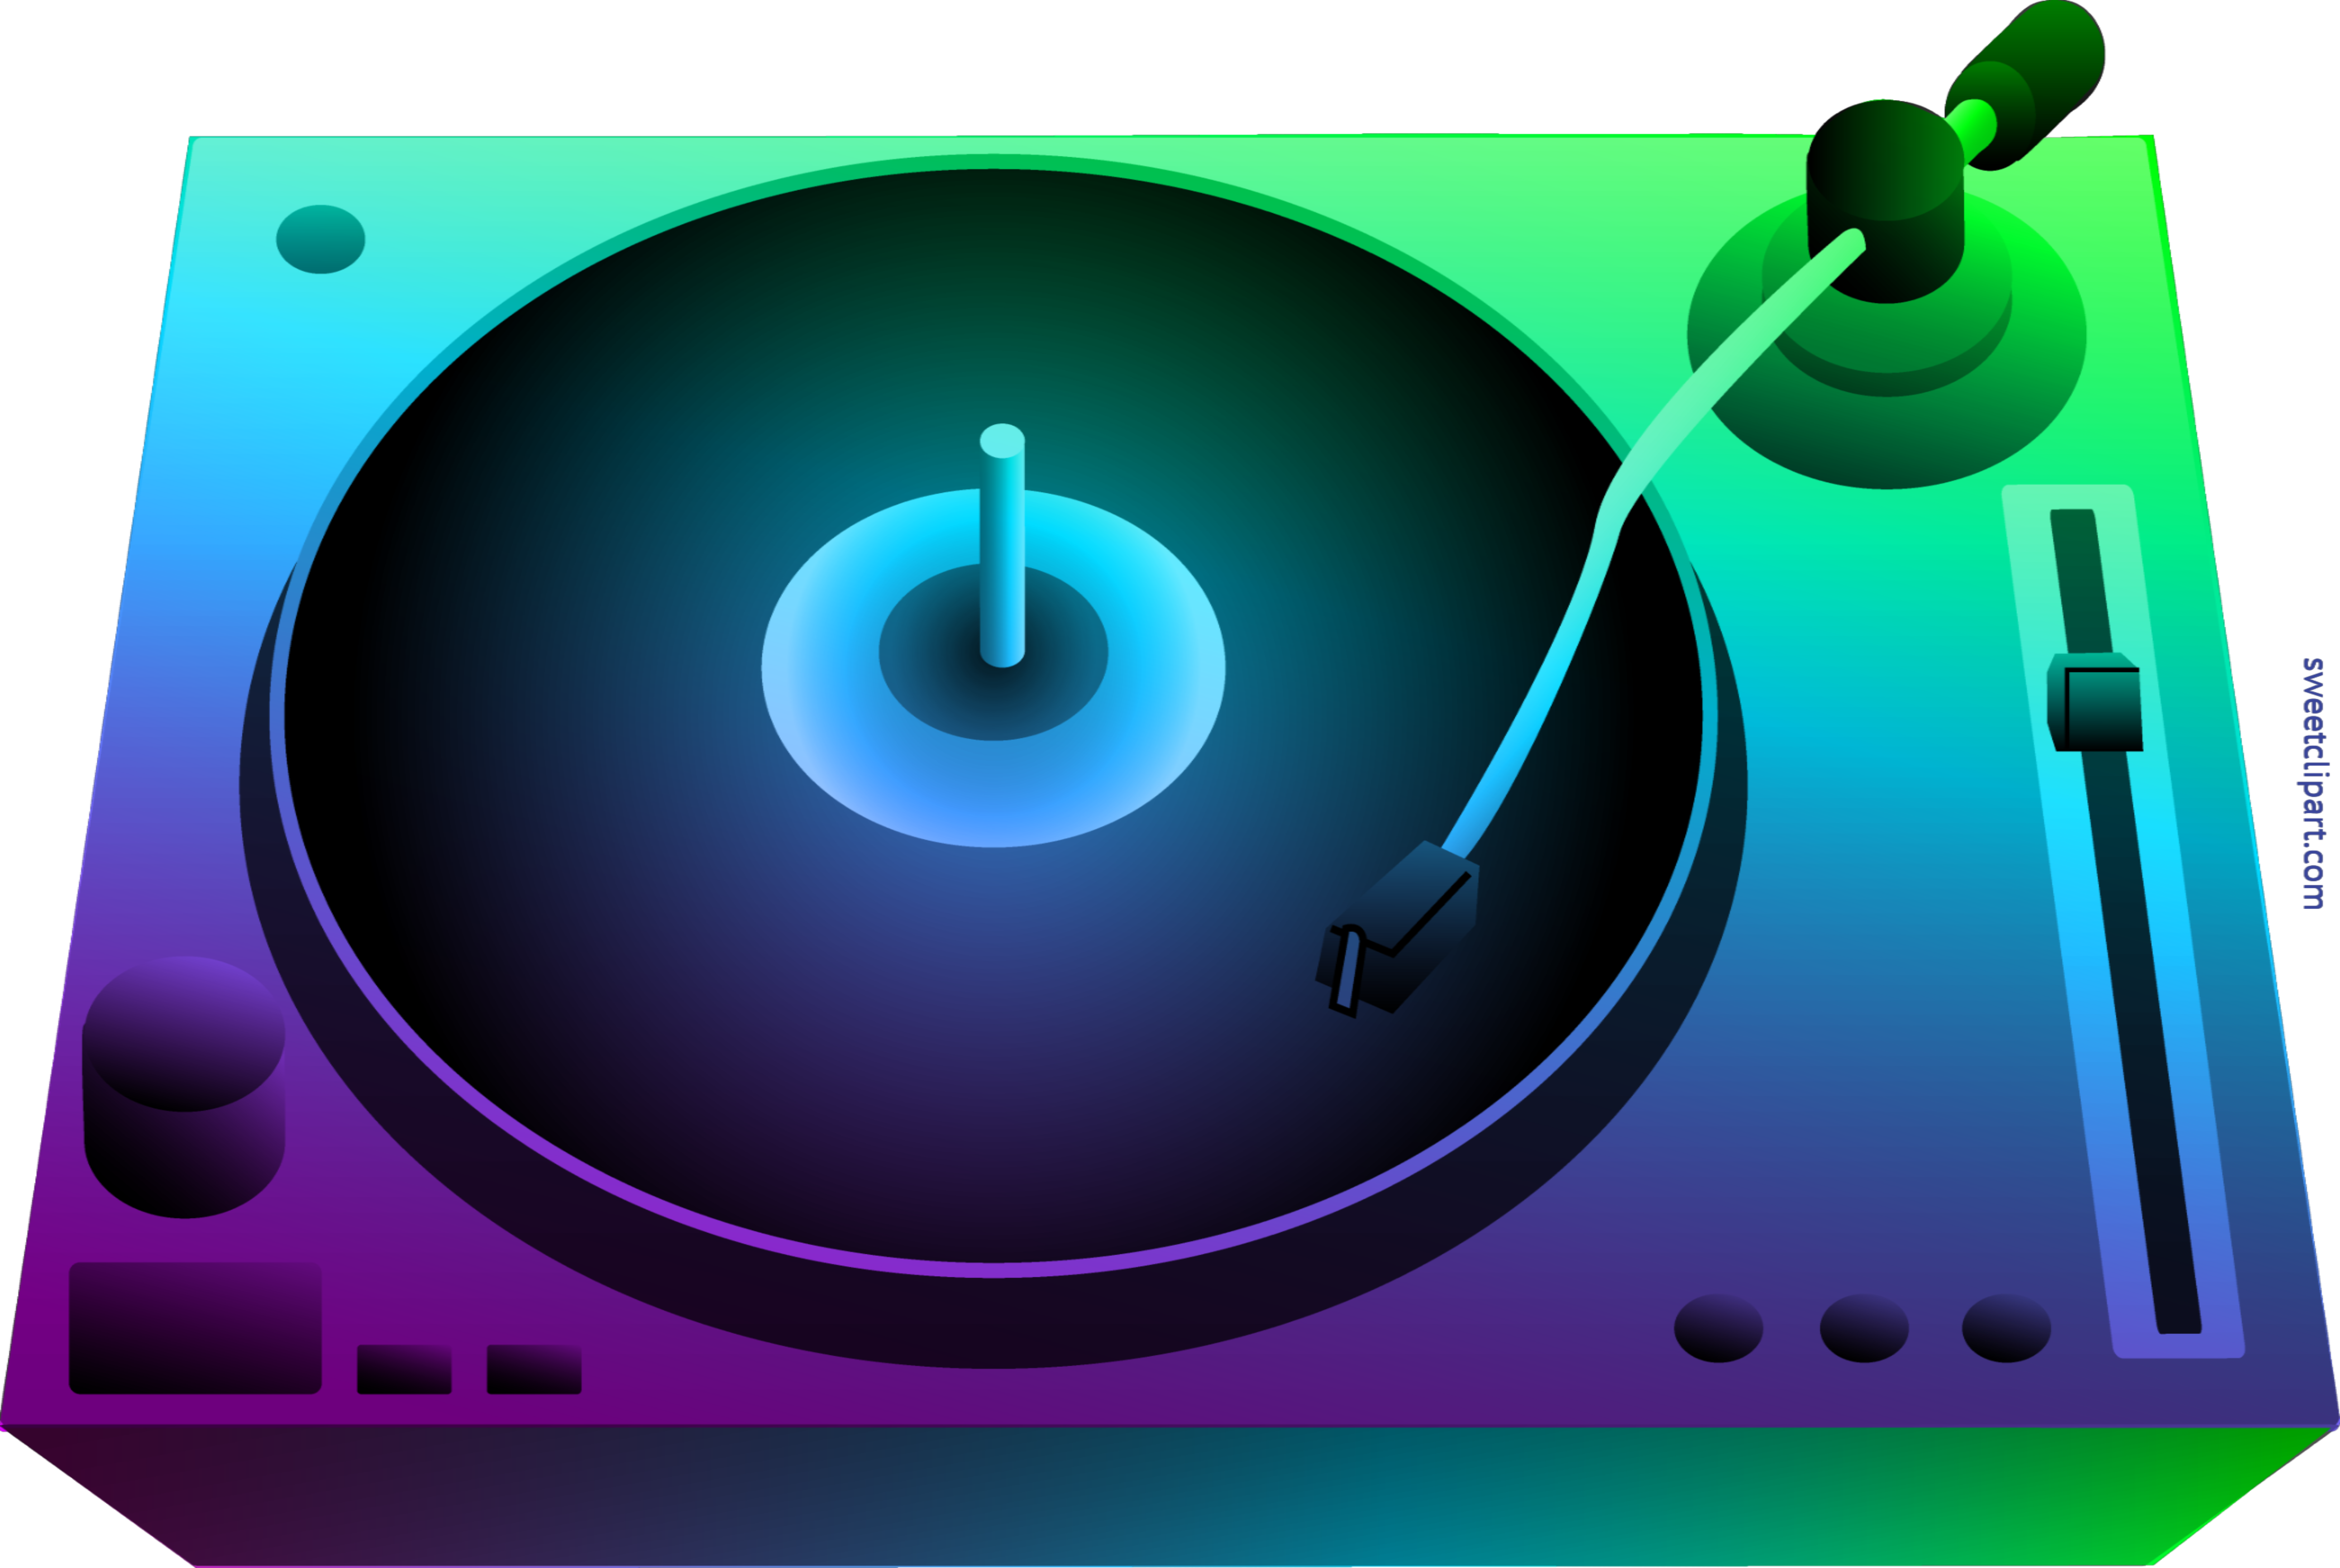 dj turntable neon light clip art sweet clip art rh m sweetclipart com dj turntable clipart turntable clipart